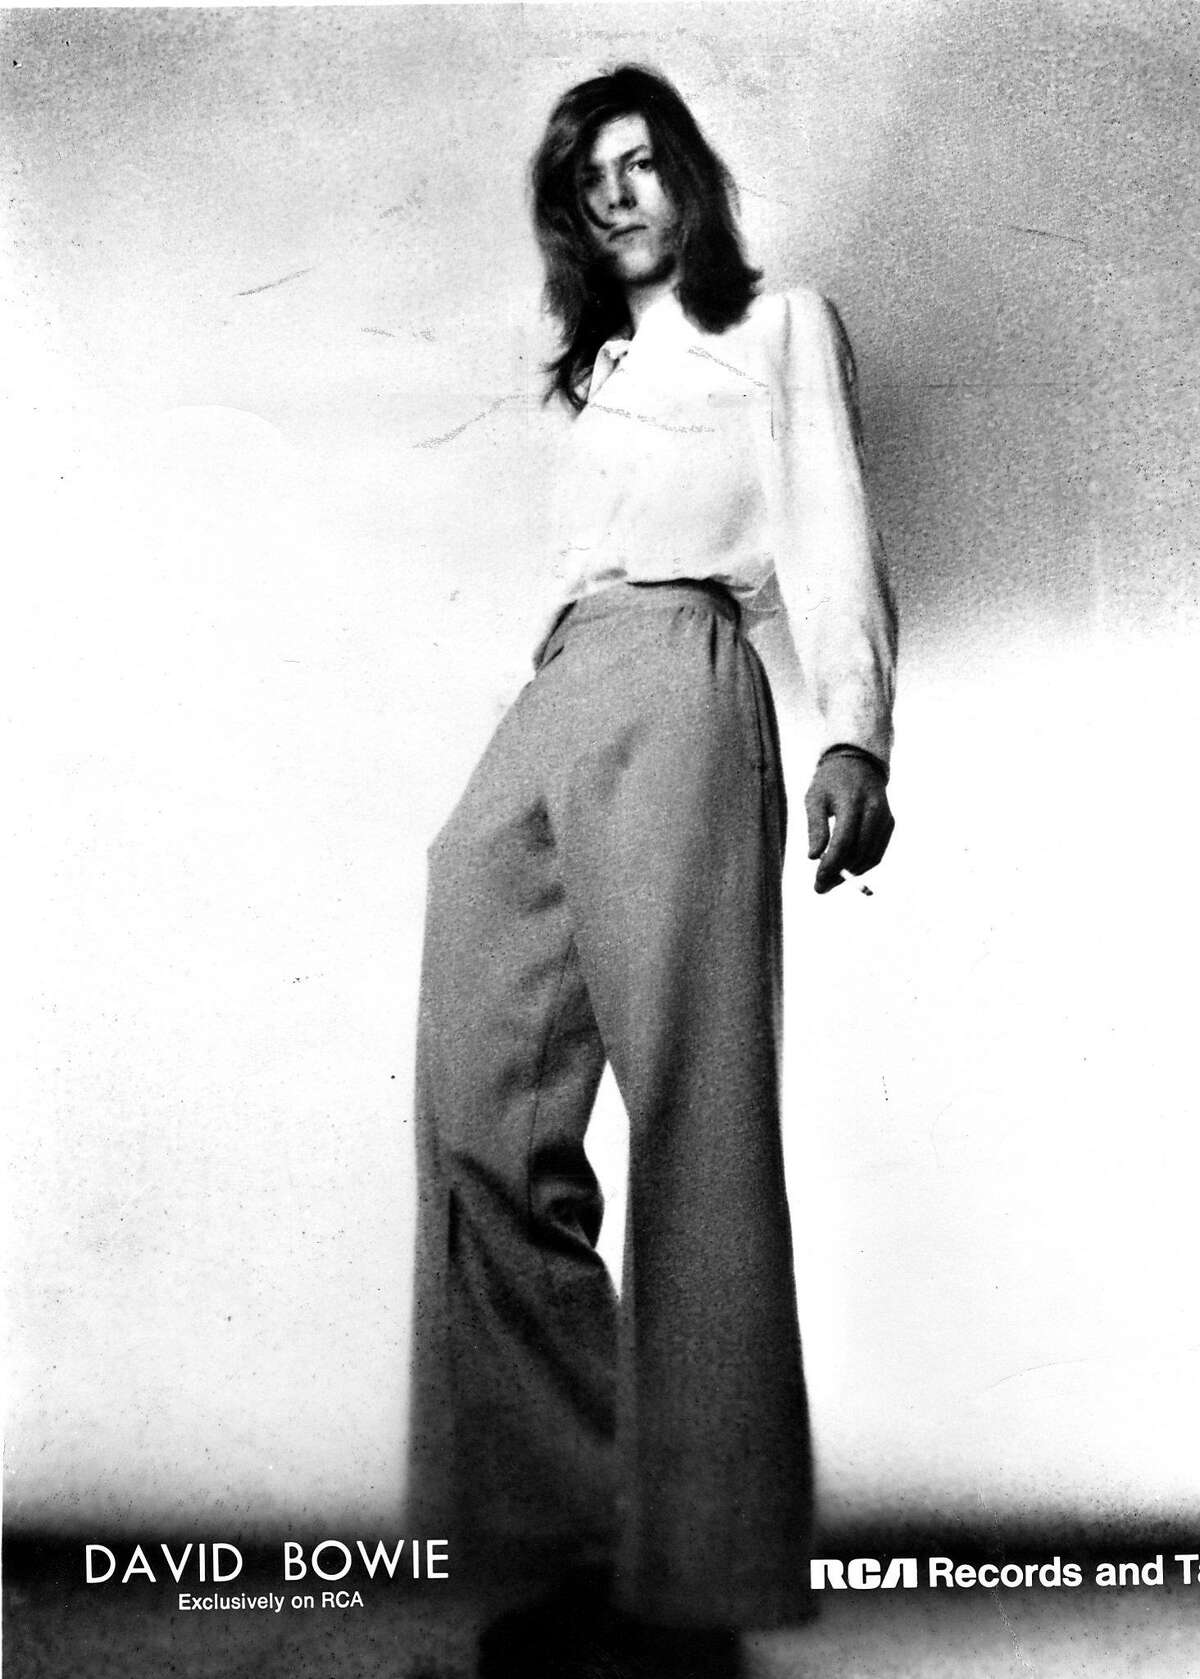 David Bowie in 1972 Phot ran 10/15/1972, p. 19